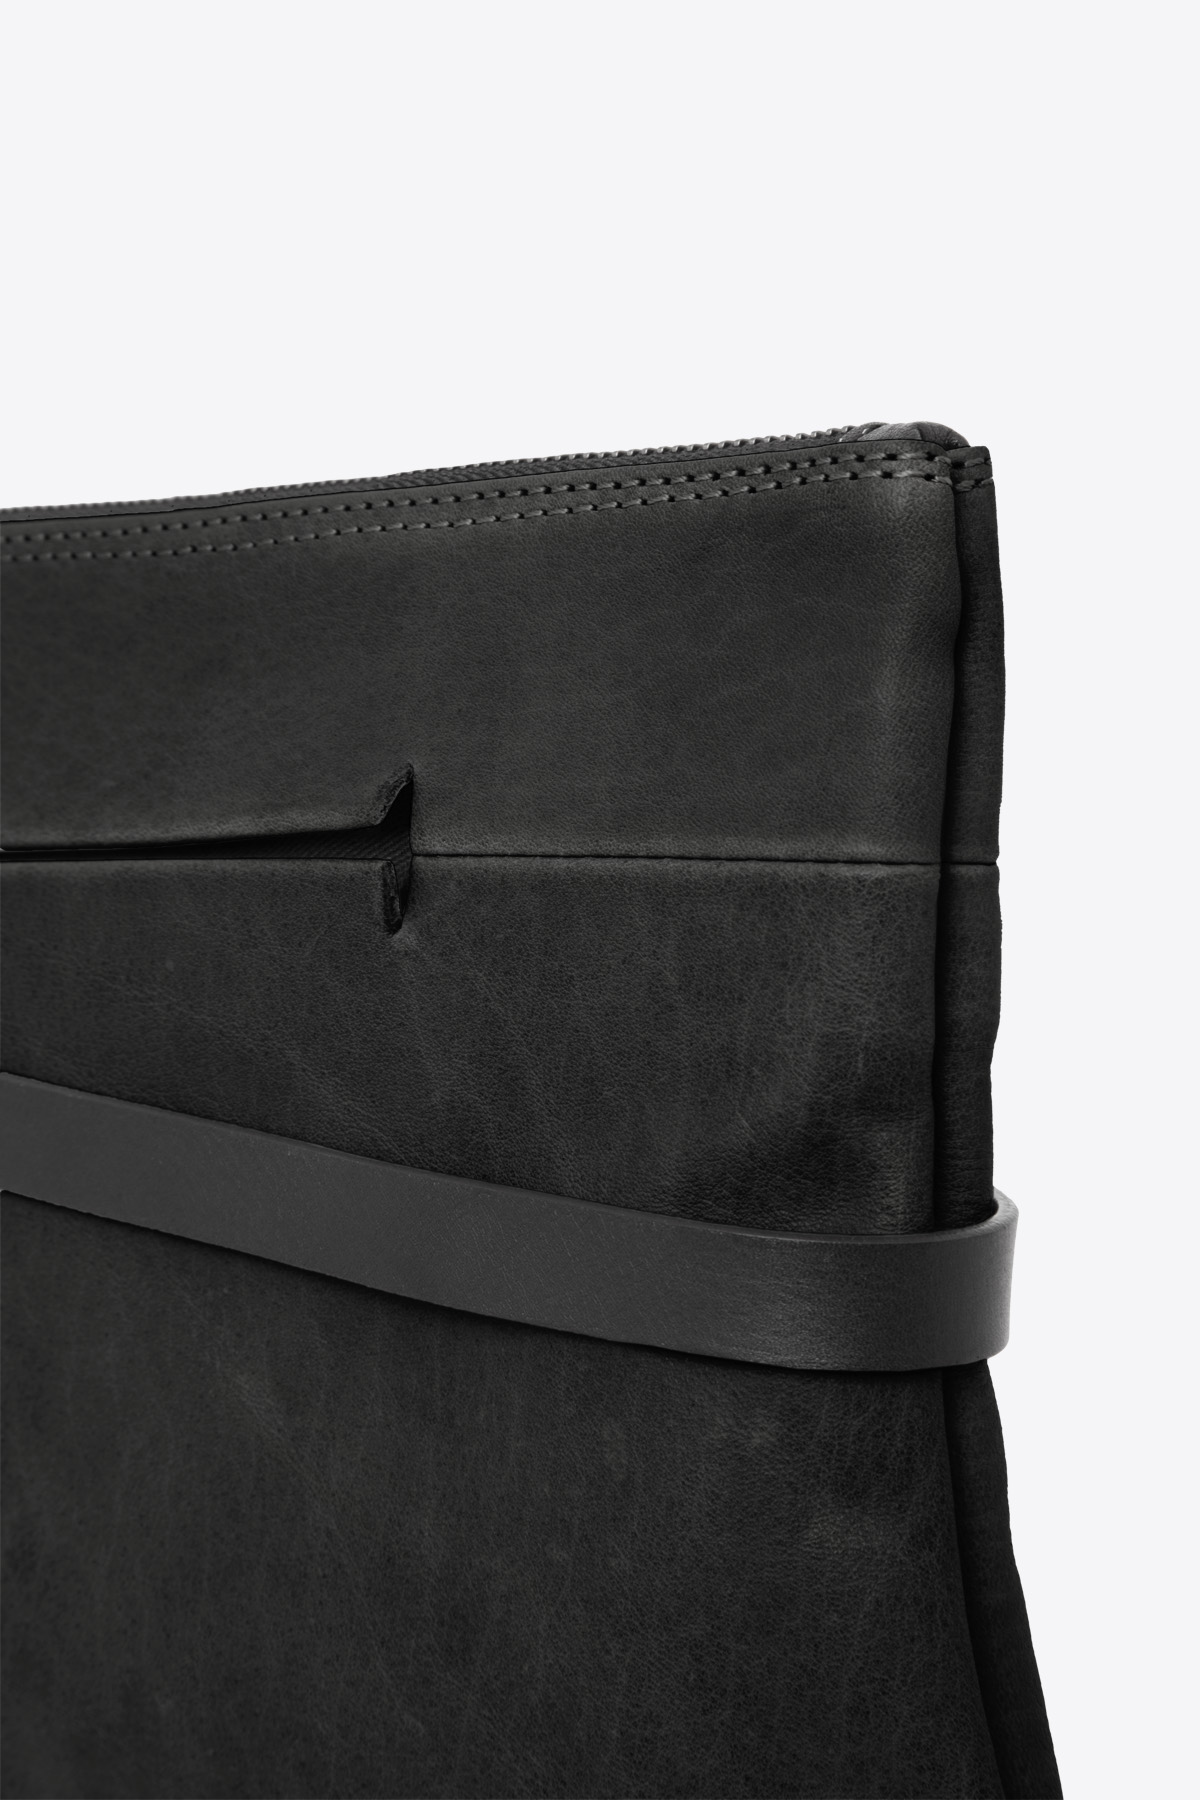 dclr004l-tapeclutch-a1-black-detail